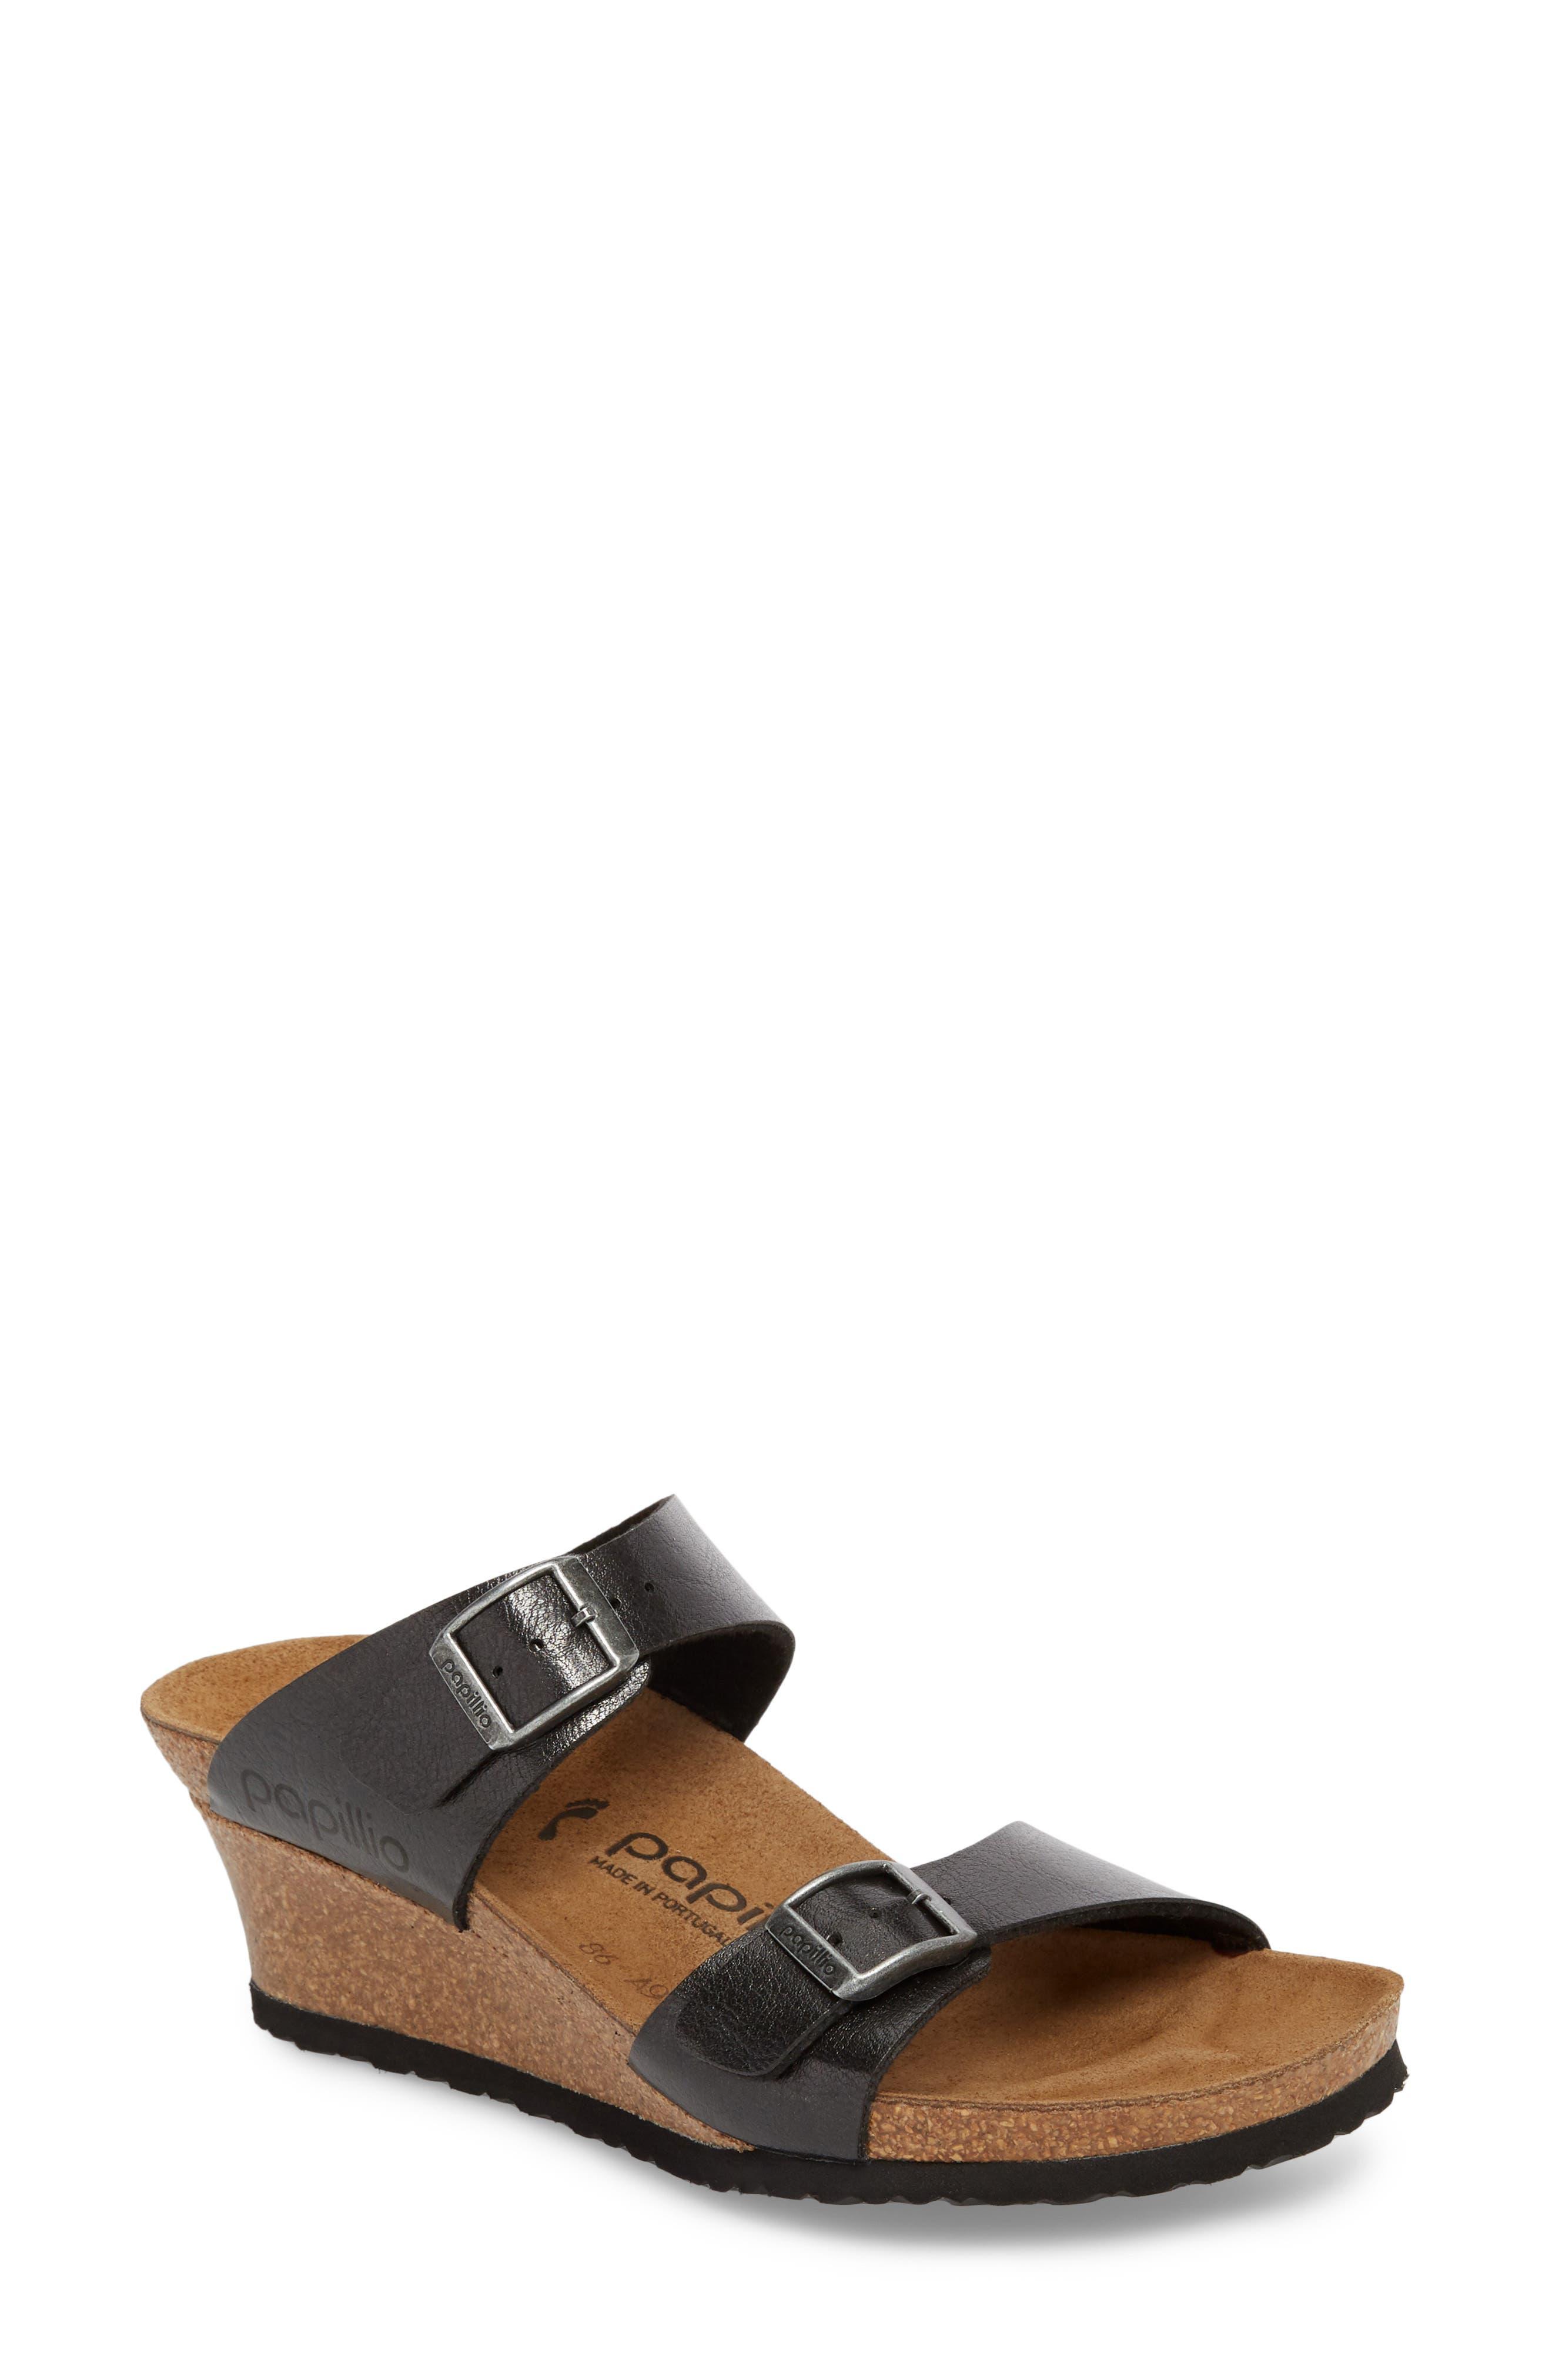 Papillio by Birkenstock Dorothy Wedge Slide Sandal,                         Main,                         color, 002